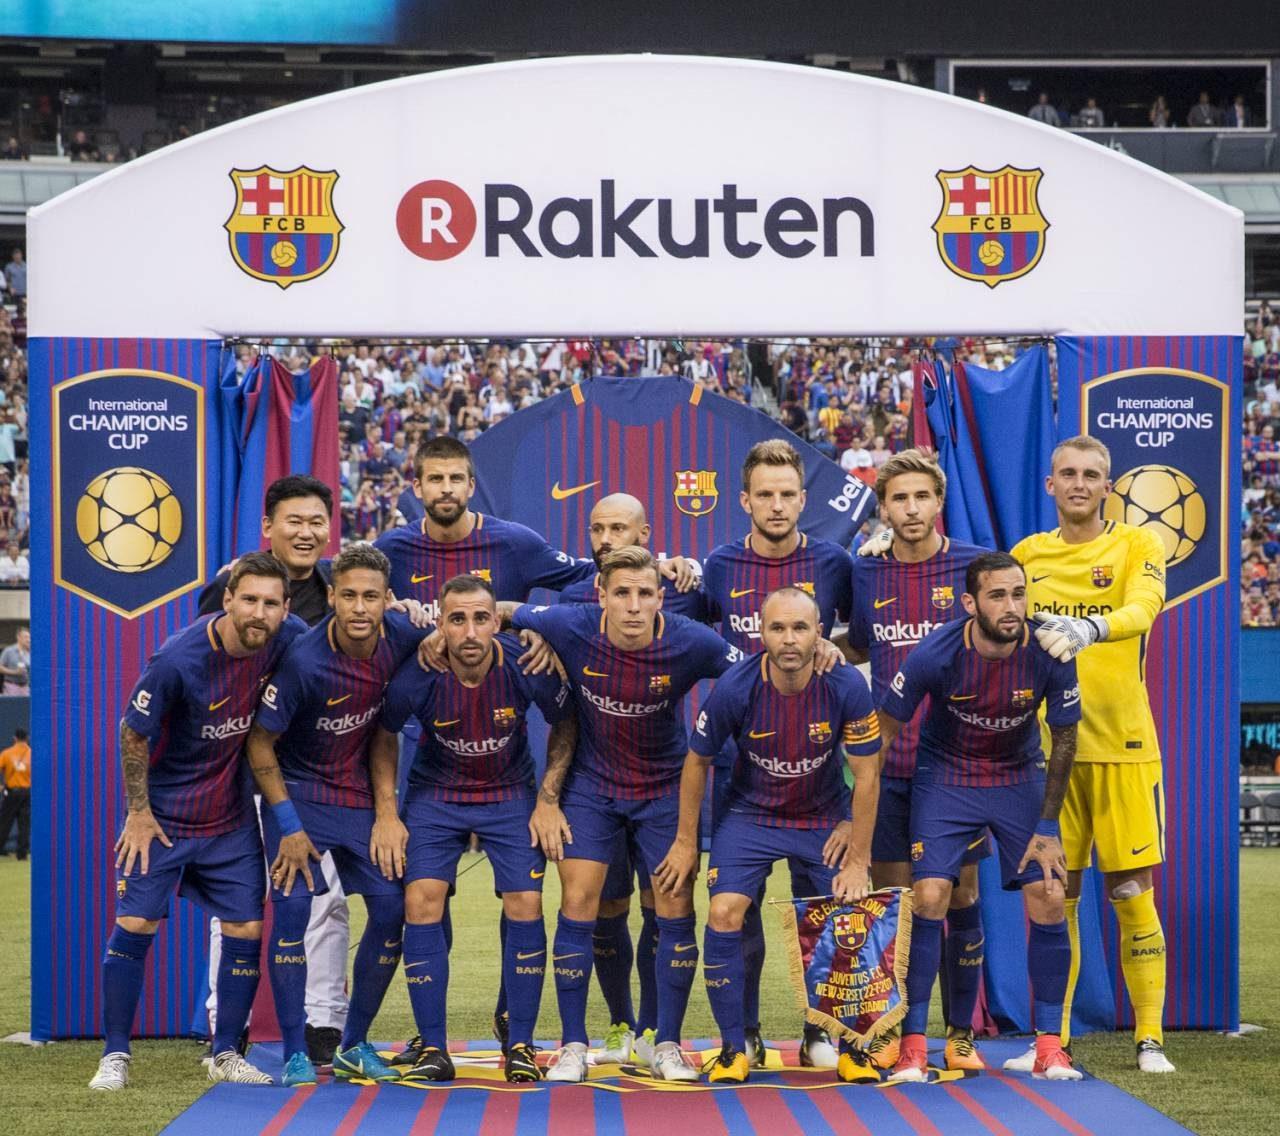 FC Barcelona unveils Rakuten jerseys for stylish win over Juventus